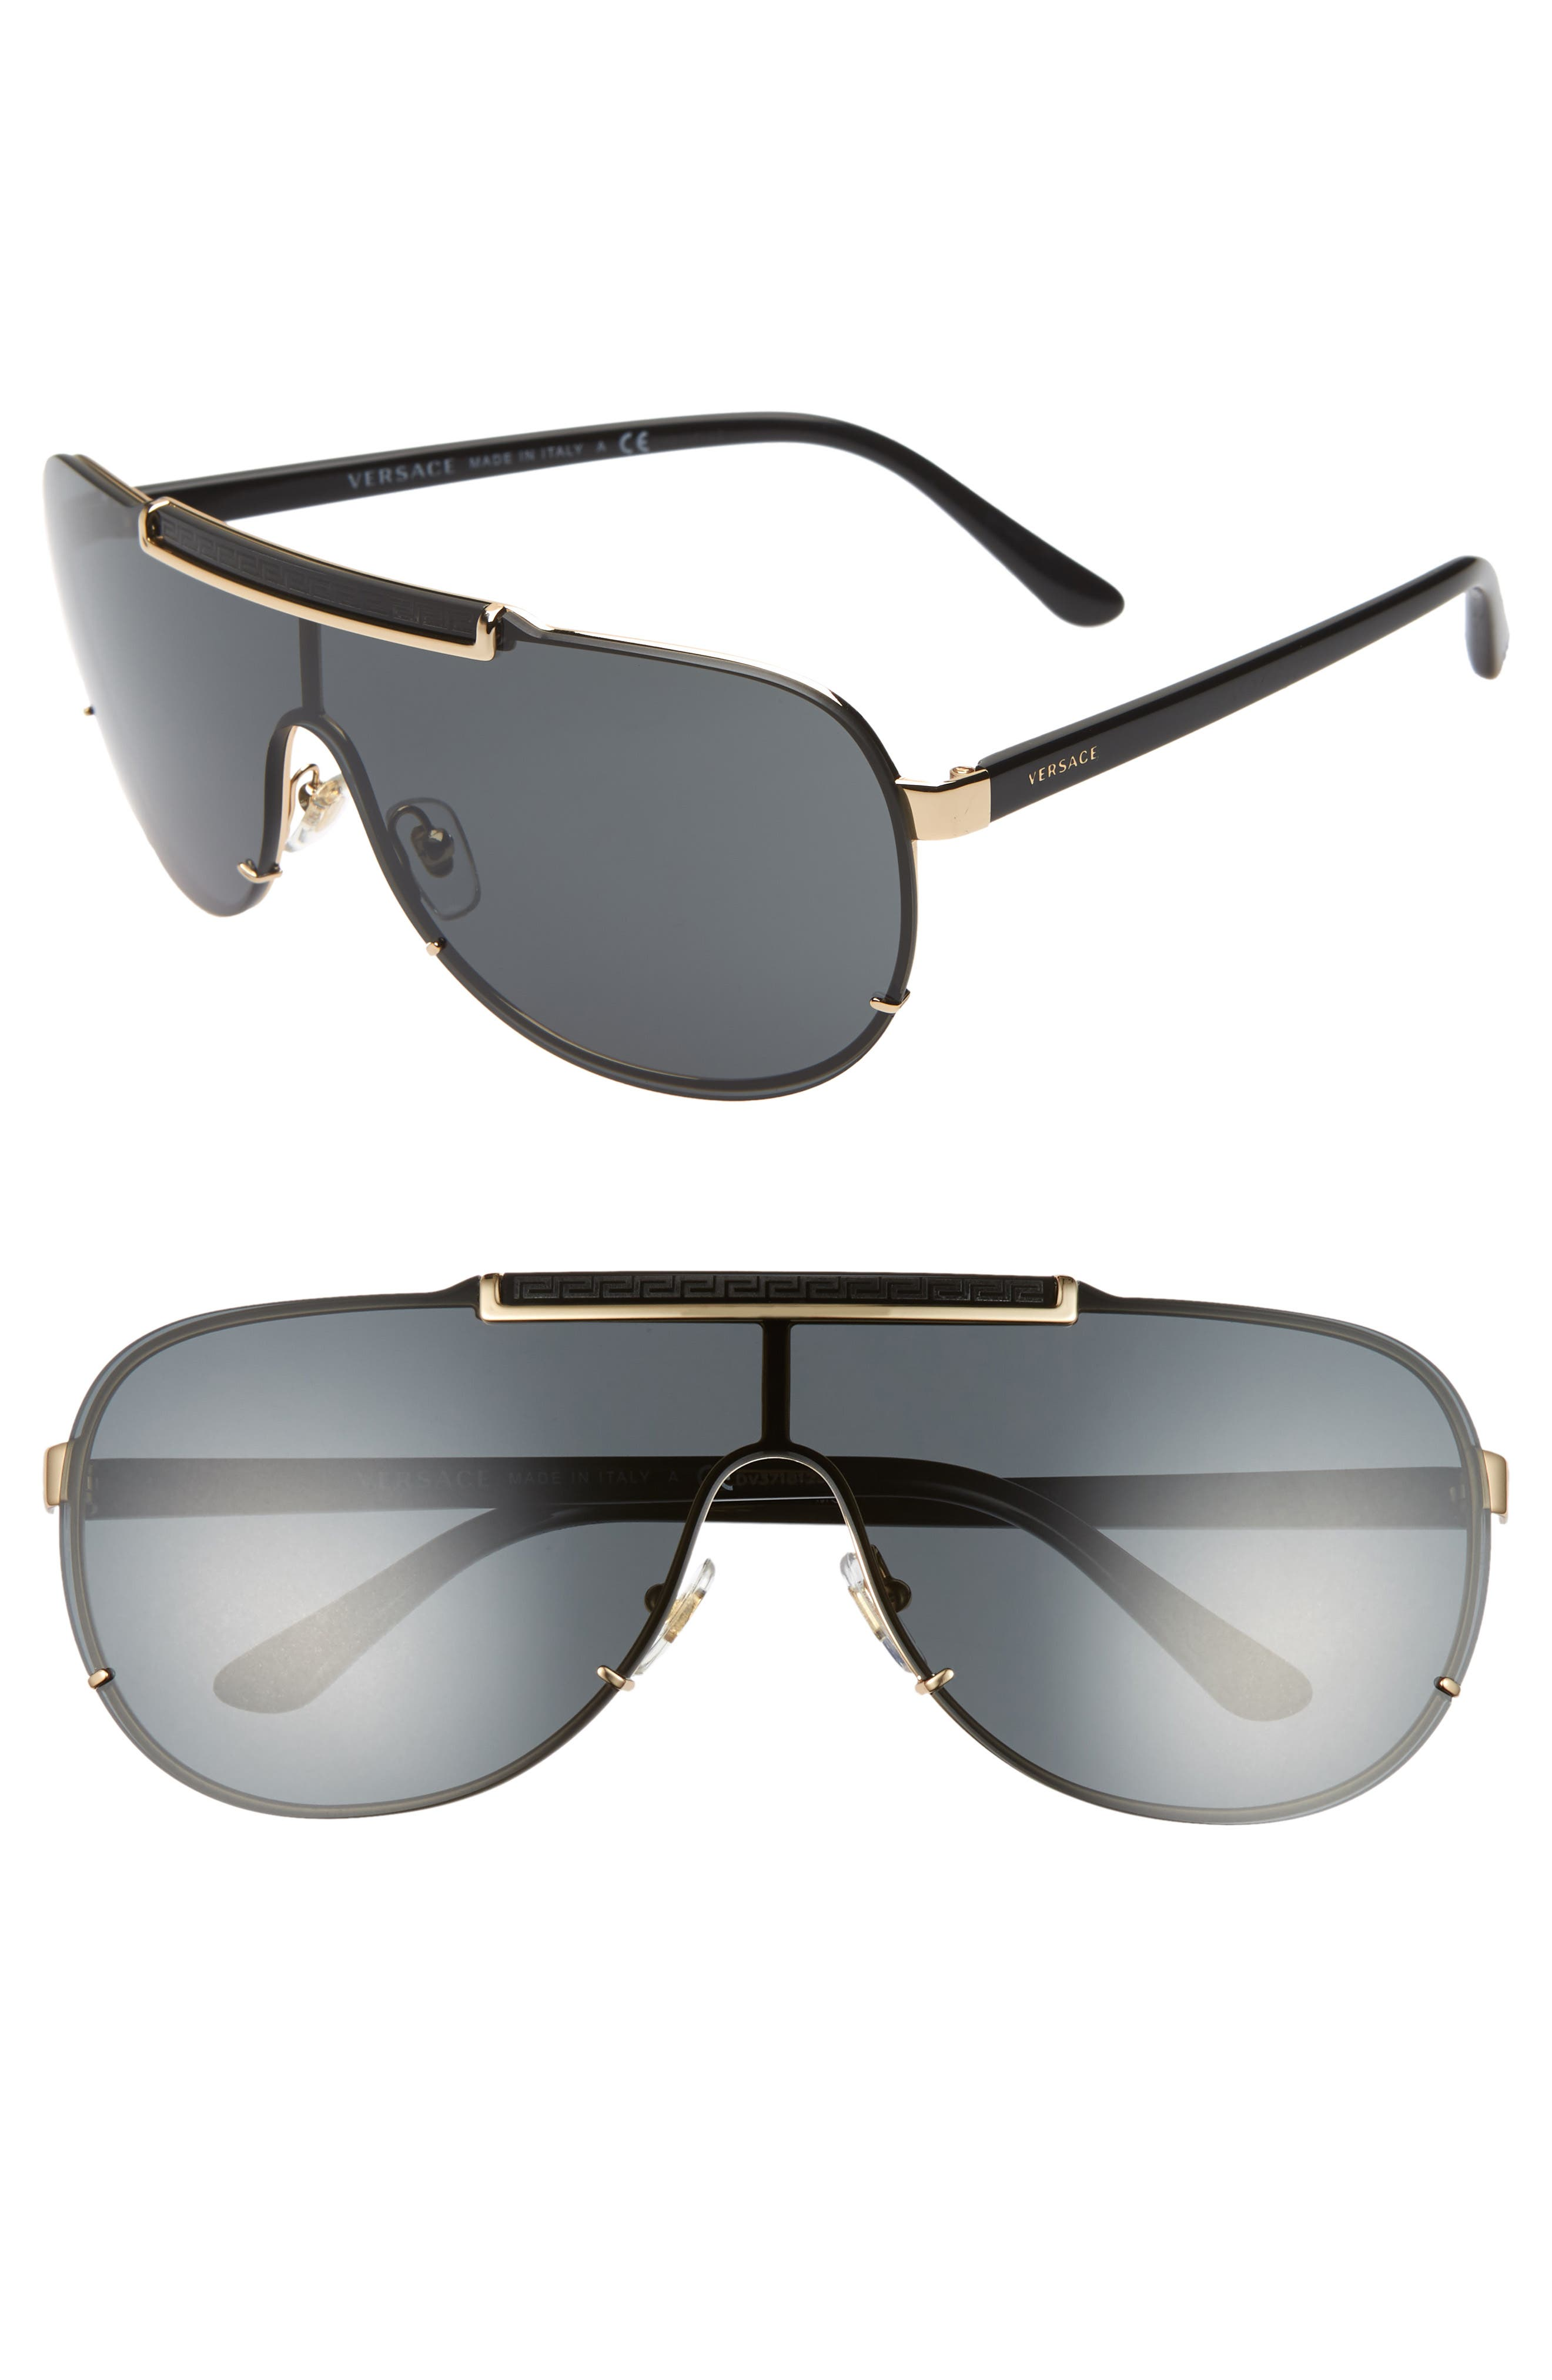 f0d698fd9d1 Women s Versace 40Mm Shield Sunglasses - Black  Gold  Black Solid